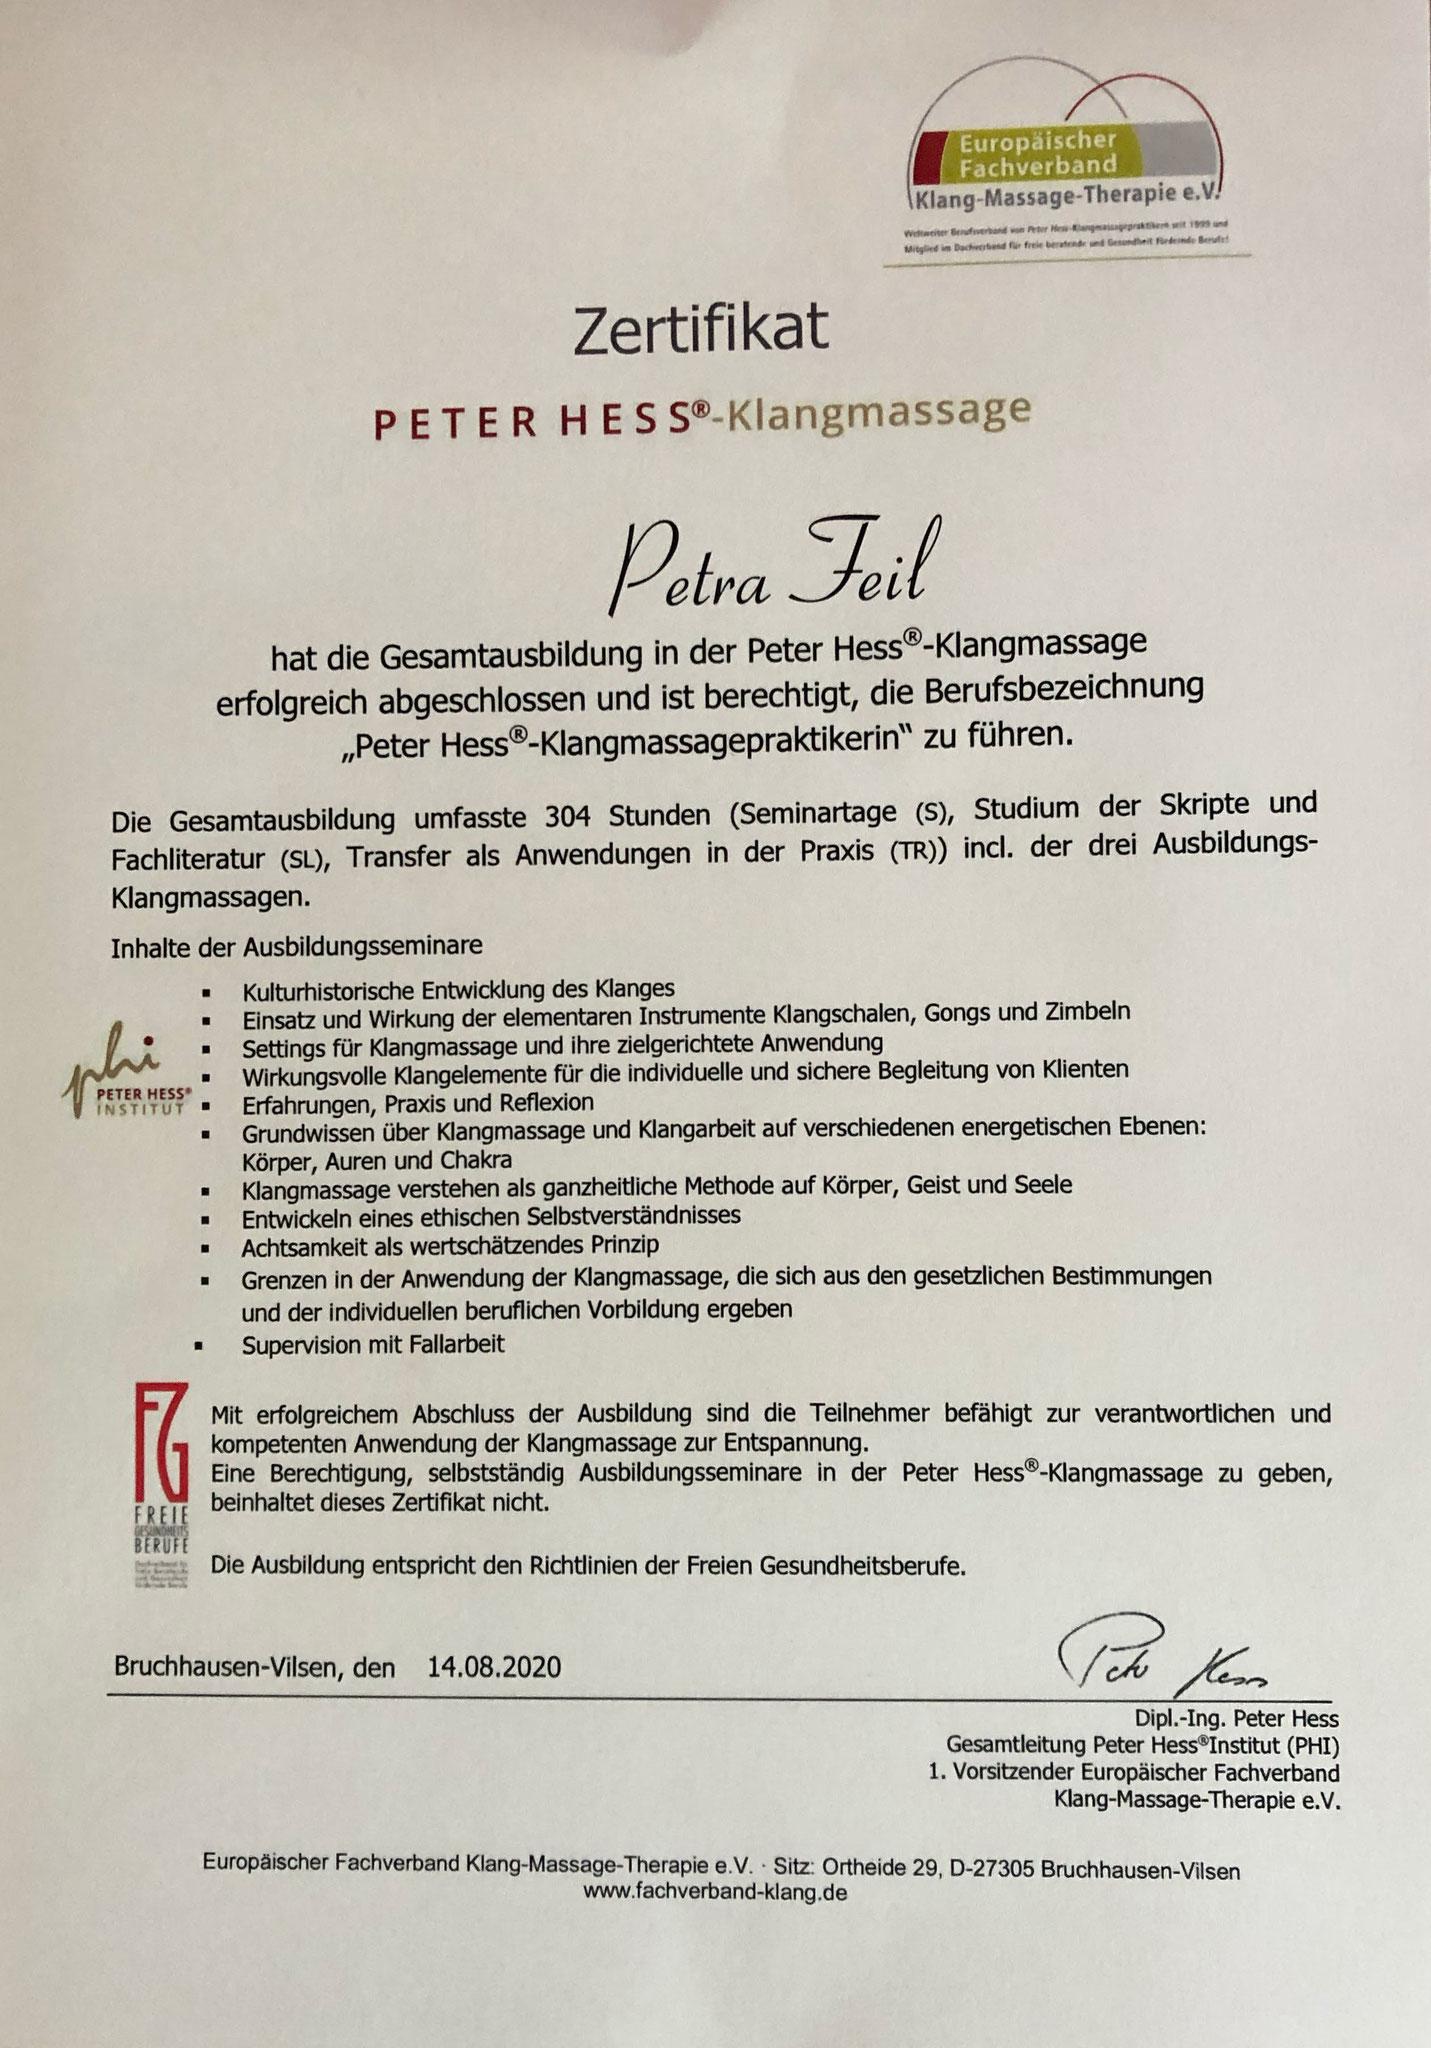 Peter Hess®-Klangmassagepraktikerin - freie Gesundheitsberufe